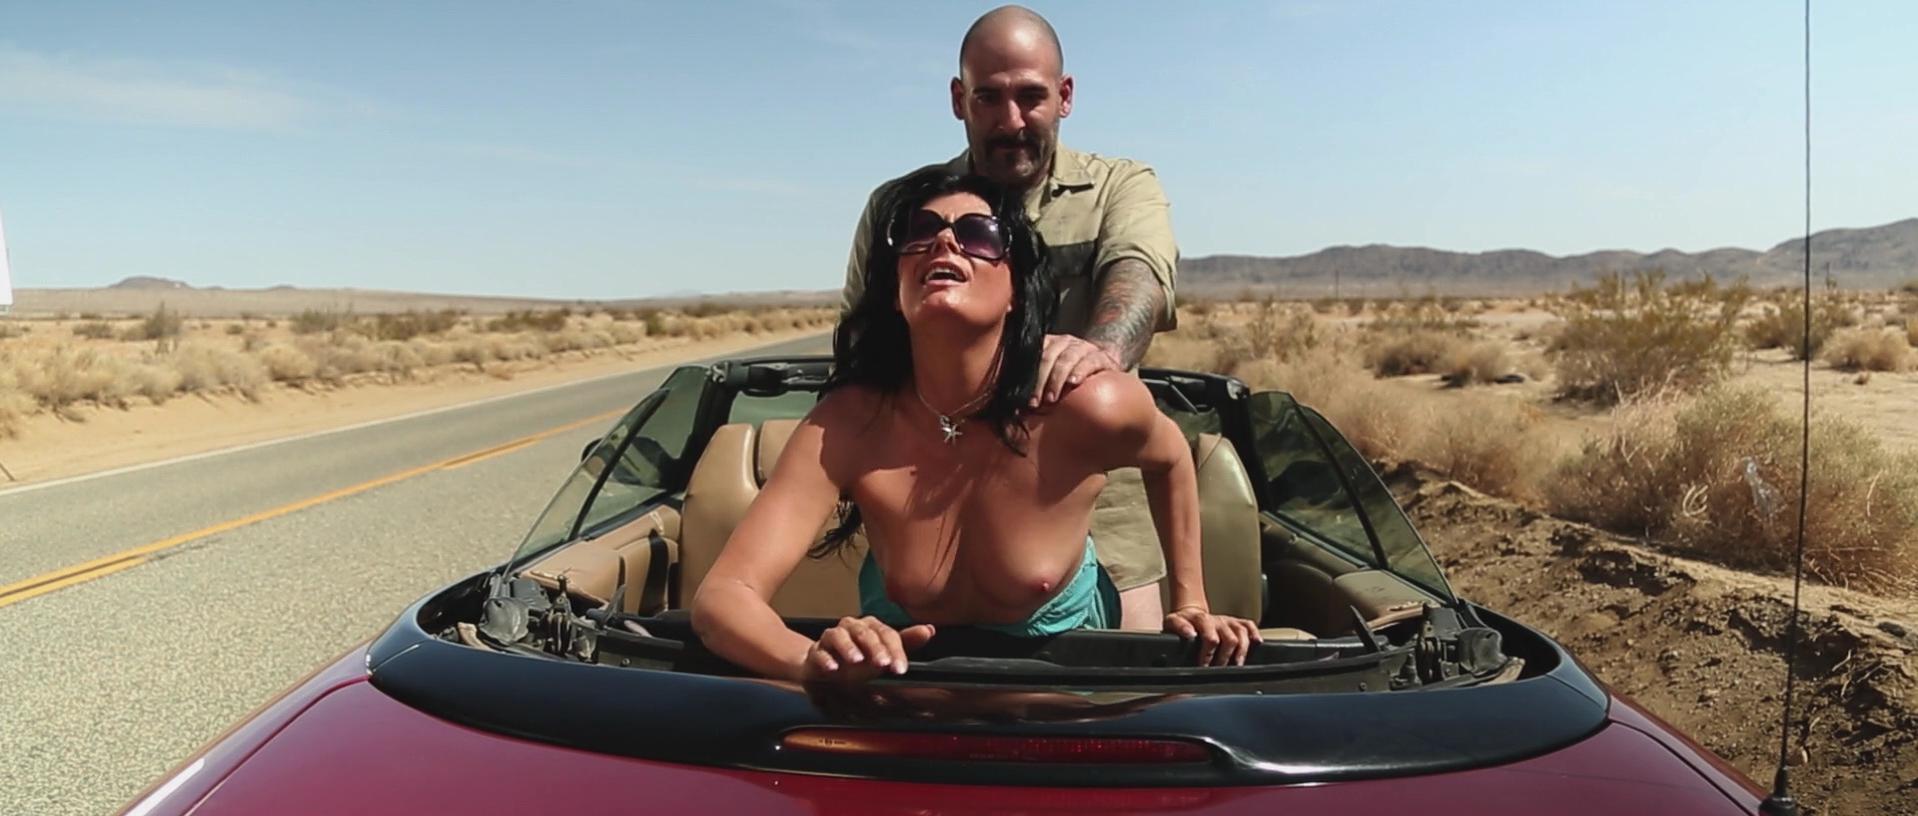 Carolyn Dorsey nude, Kerry Krogstad nude - American Muscle (2014)